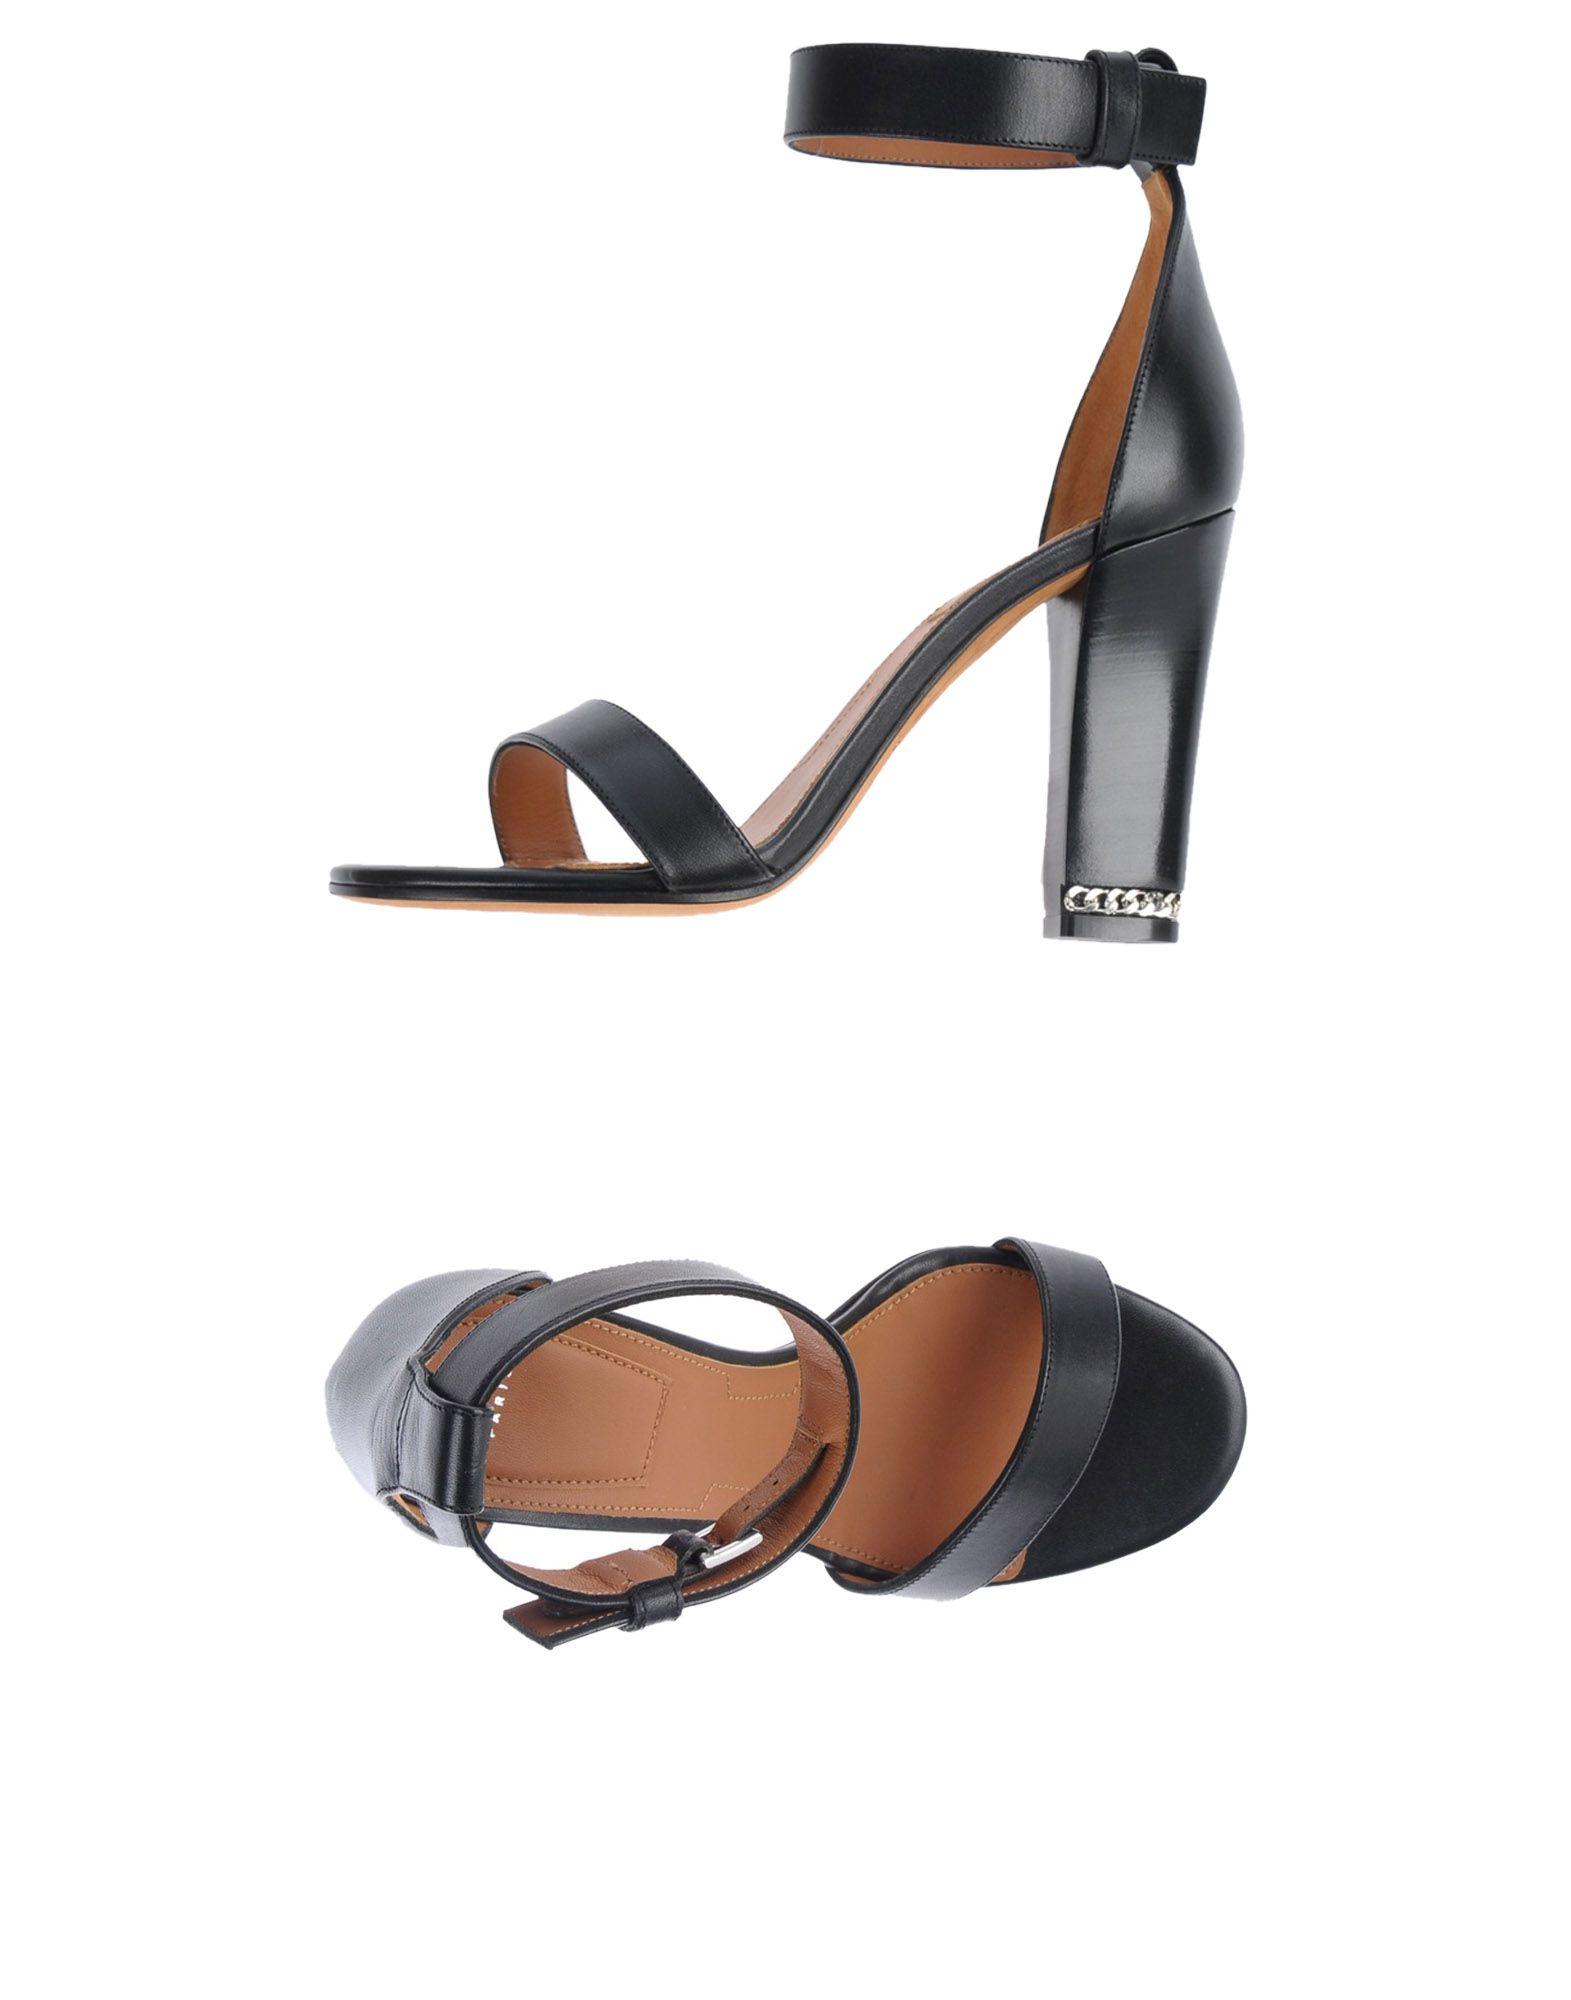 Sandali Givenchy Donna - Acquista online su